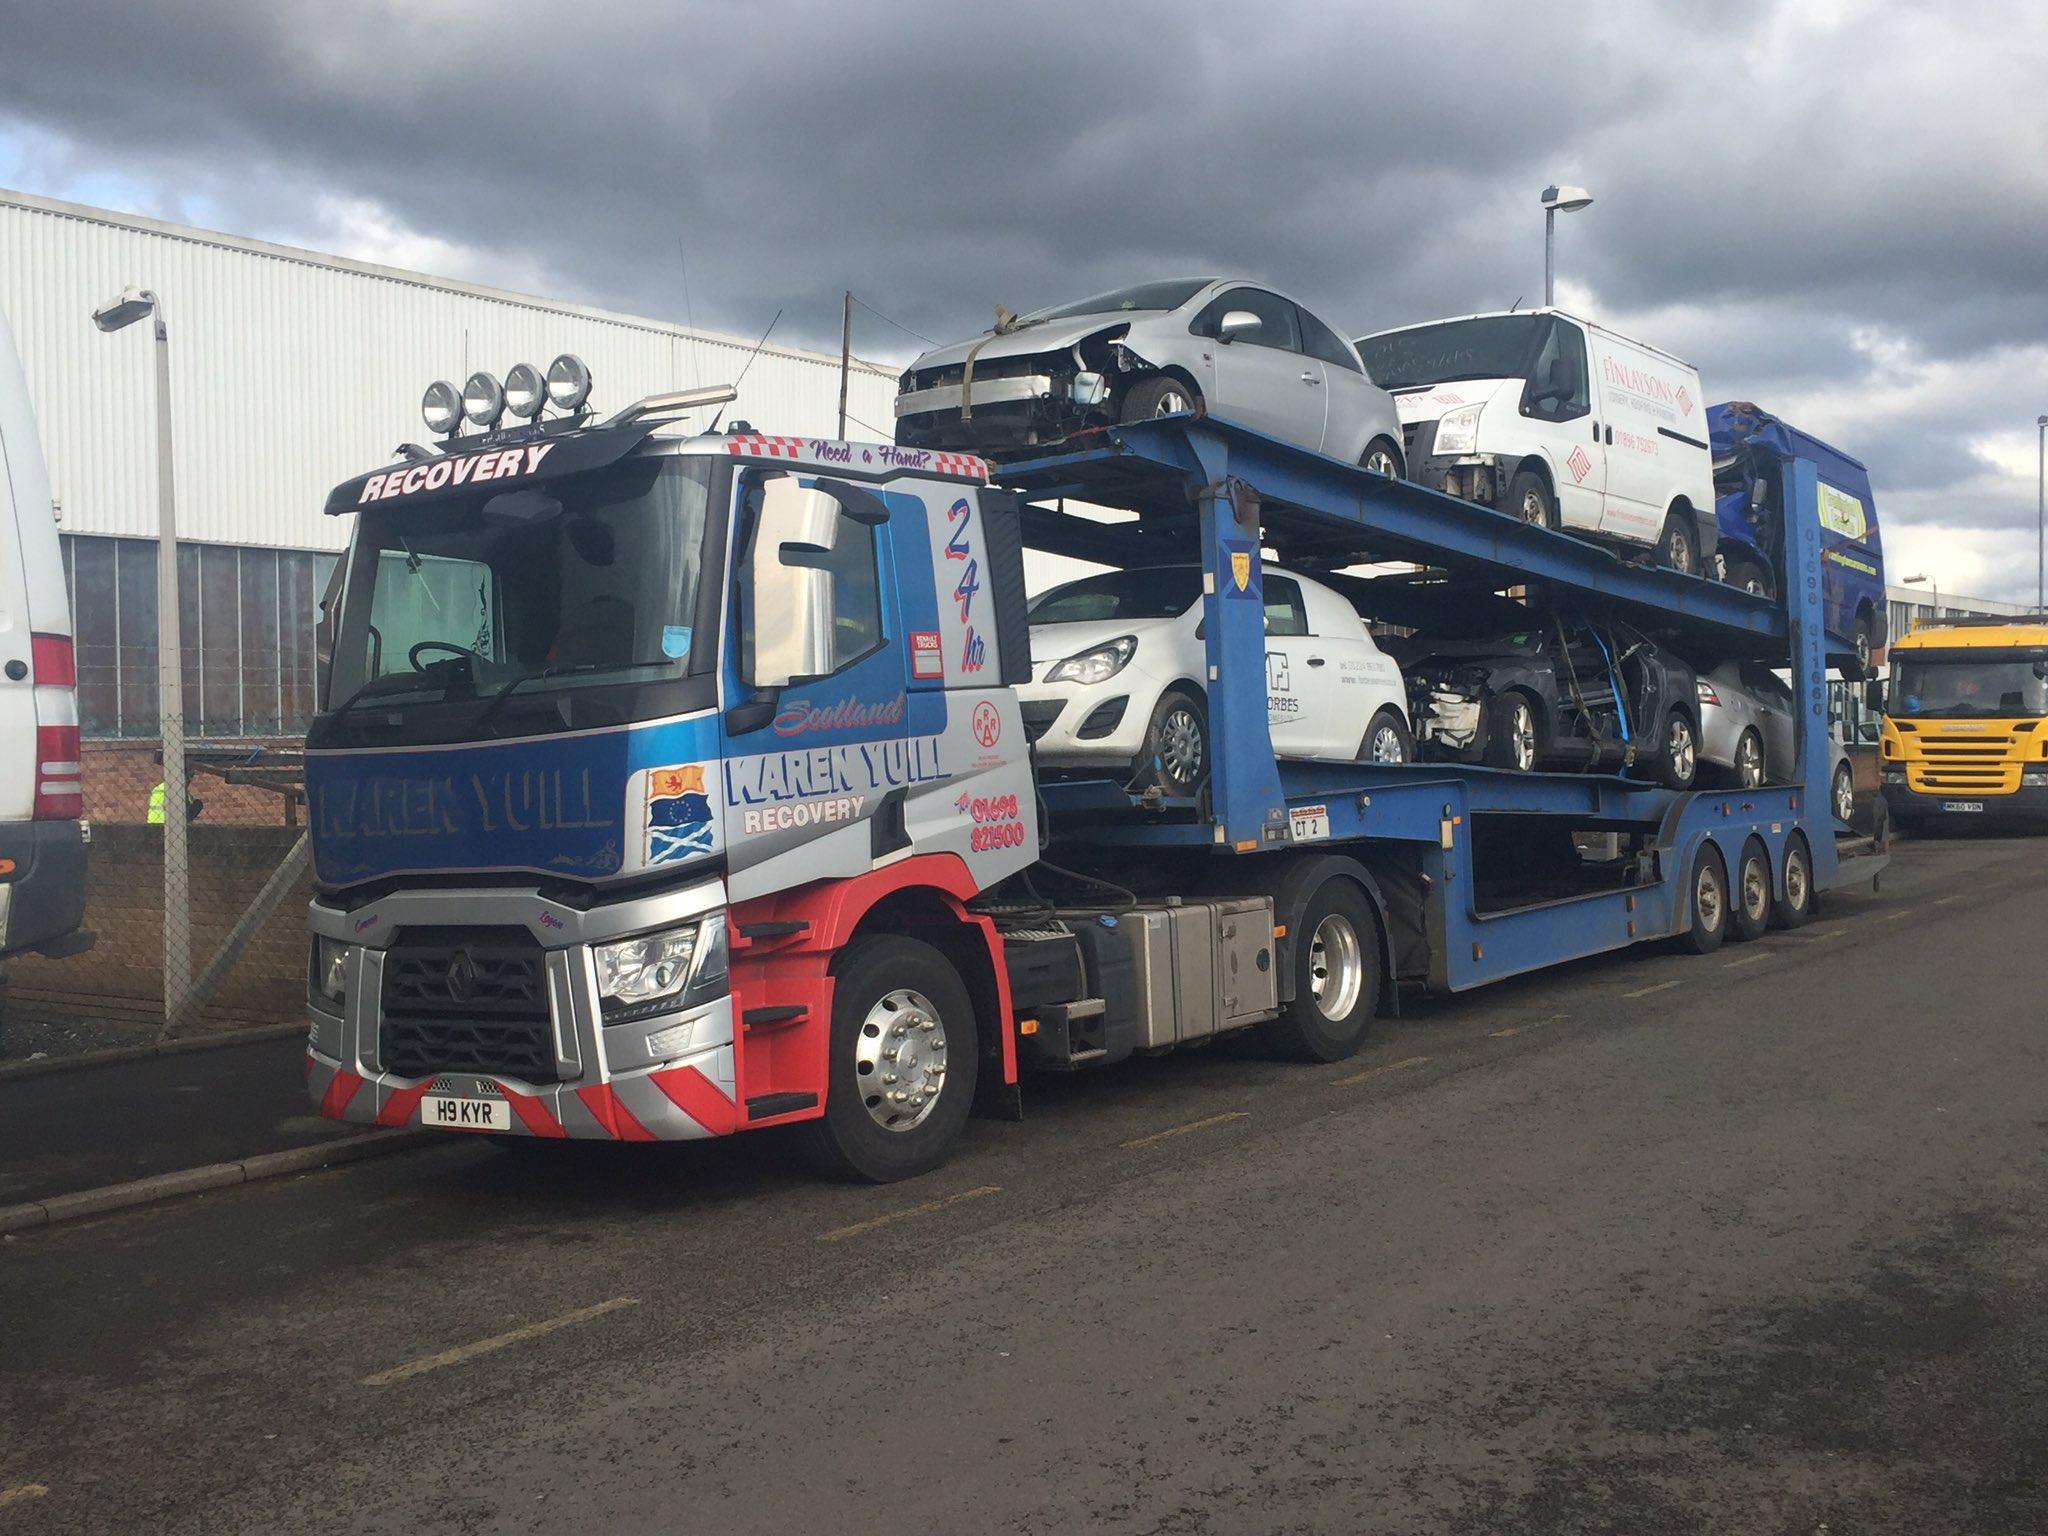 Calum renault trucks on twitter karen yuill recovery for Renault range t interieur